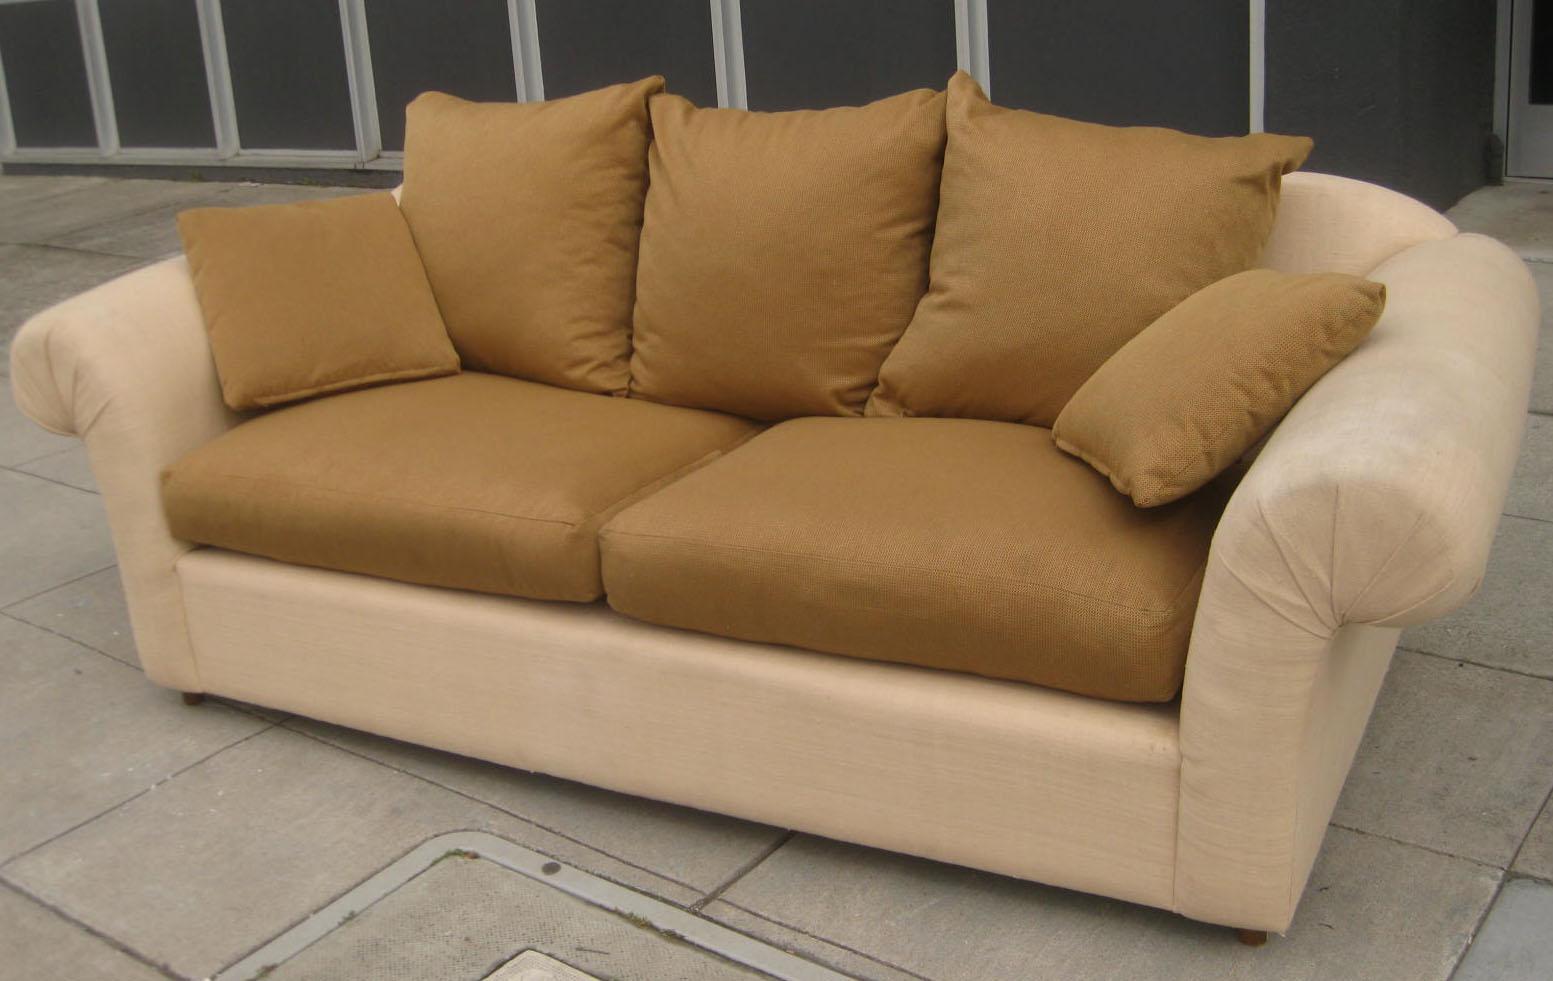 Uhuru Furniture Collectibles Sold 2 Tone Silk Sofa 100